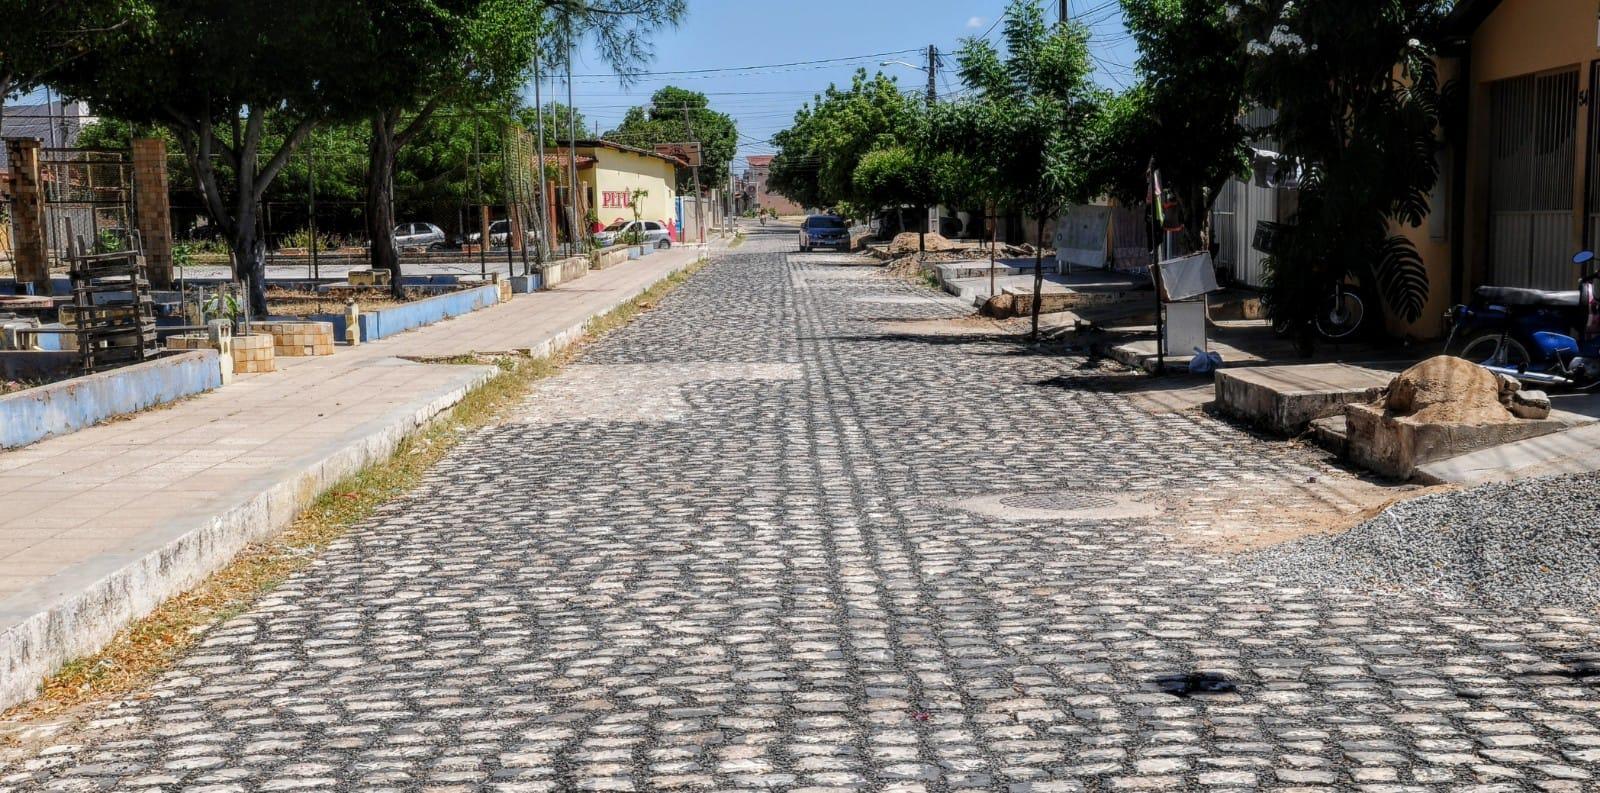 Obras de tapa-buracos contemplam ruas da Ilha de Santa Luzia